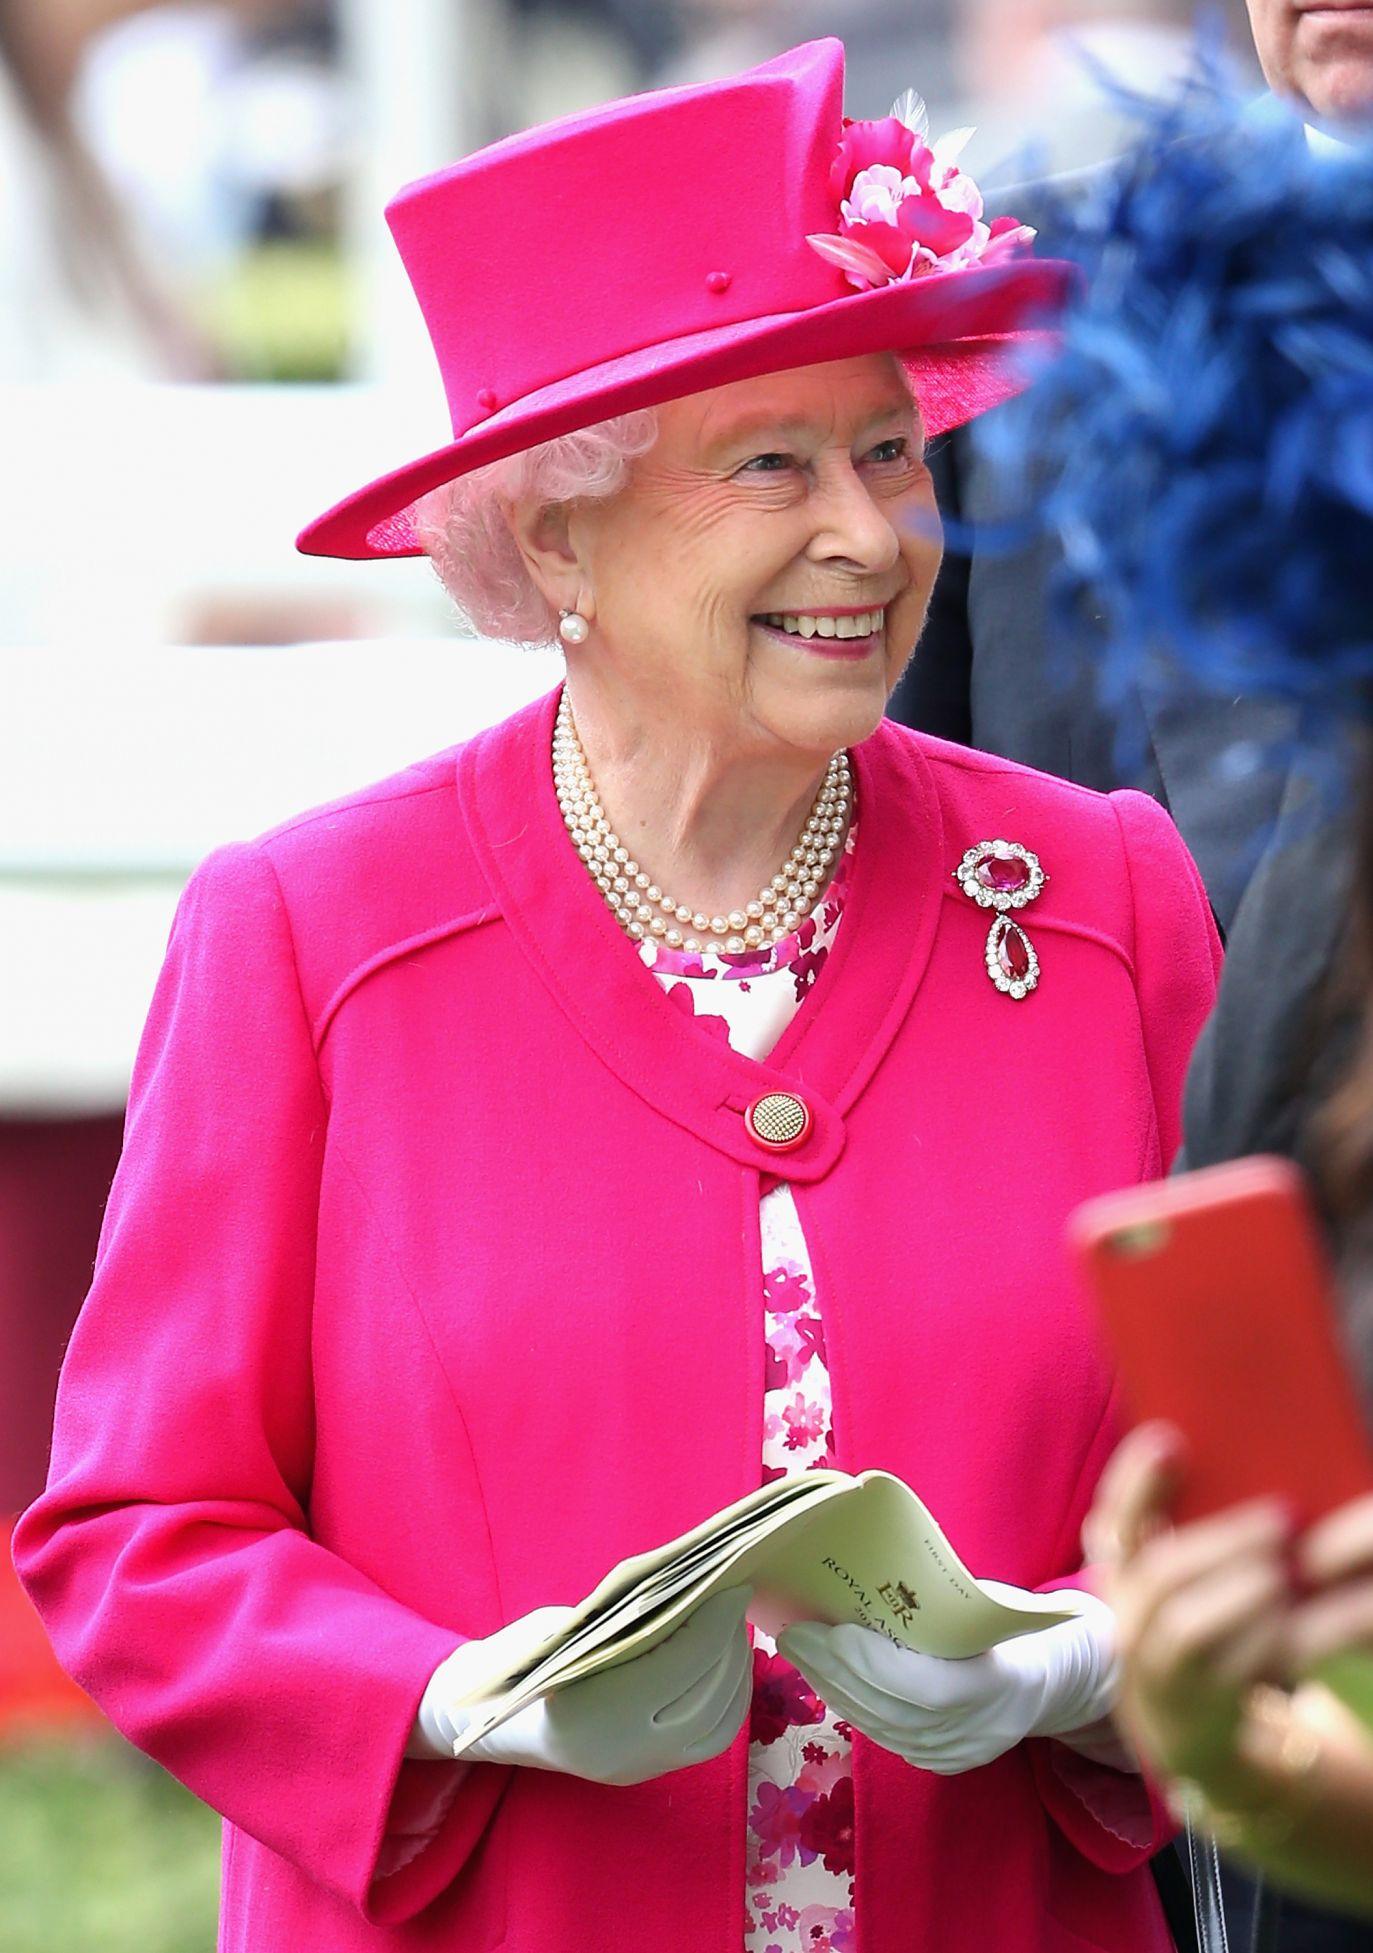 پیام-تبریک-ملکه-الیزابت-دوم-به-الیای-دوم-گرجستان